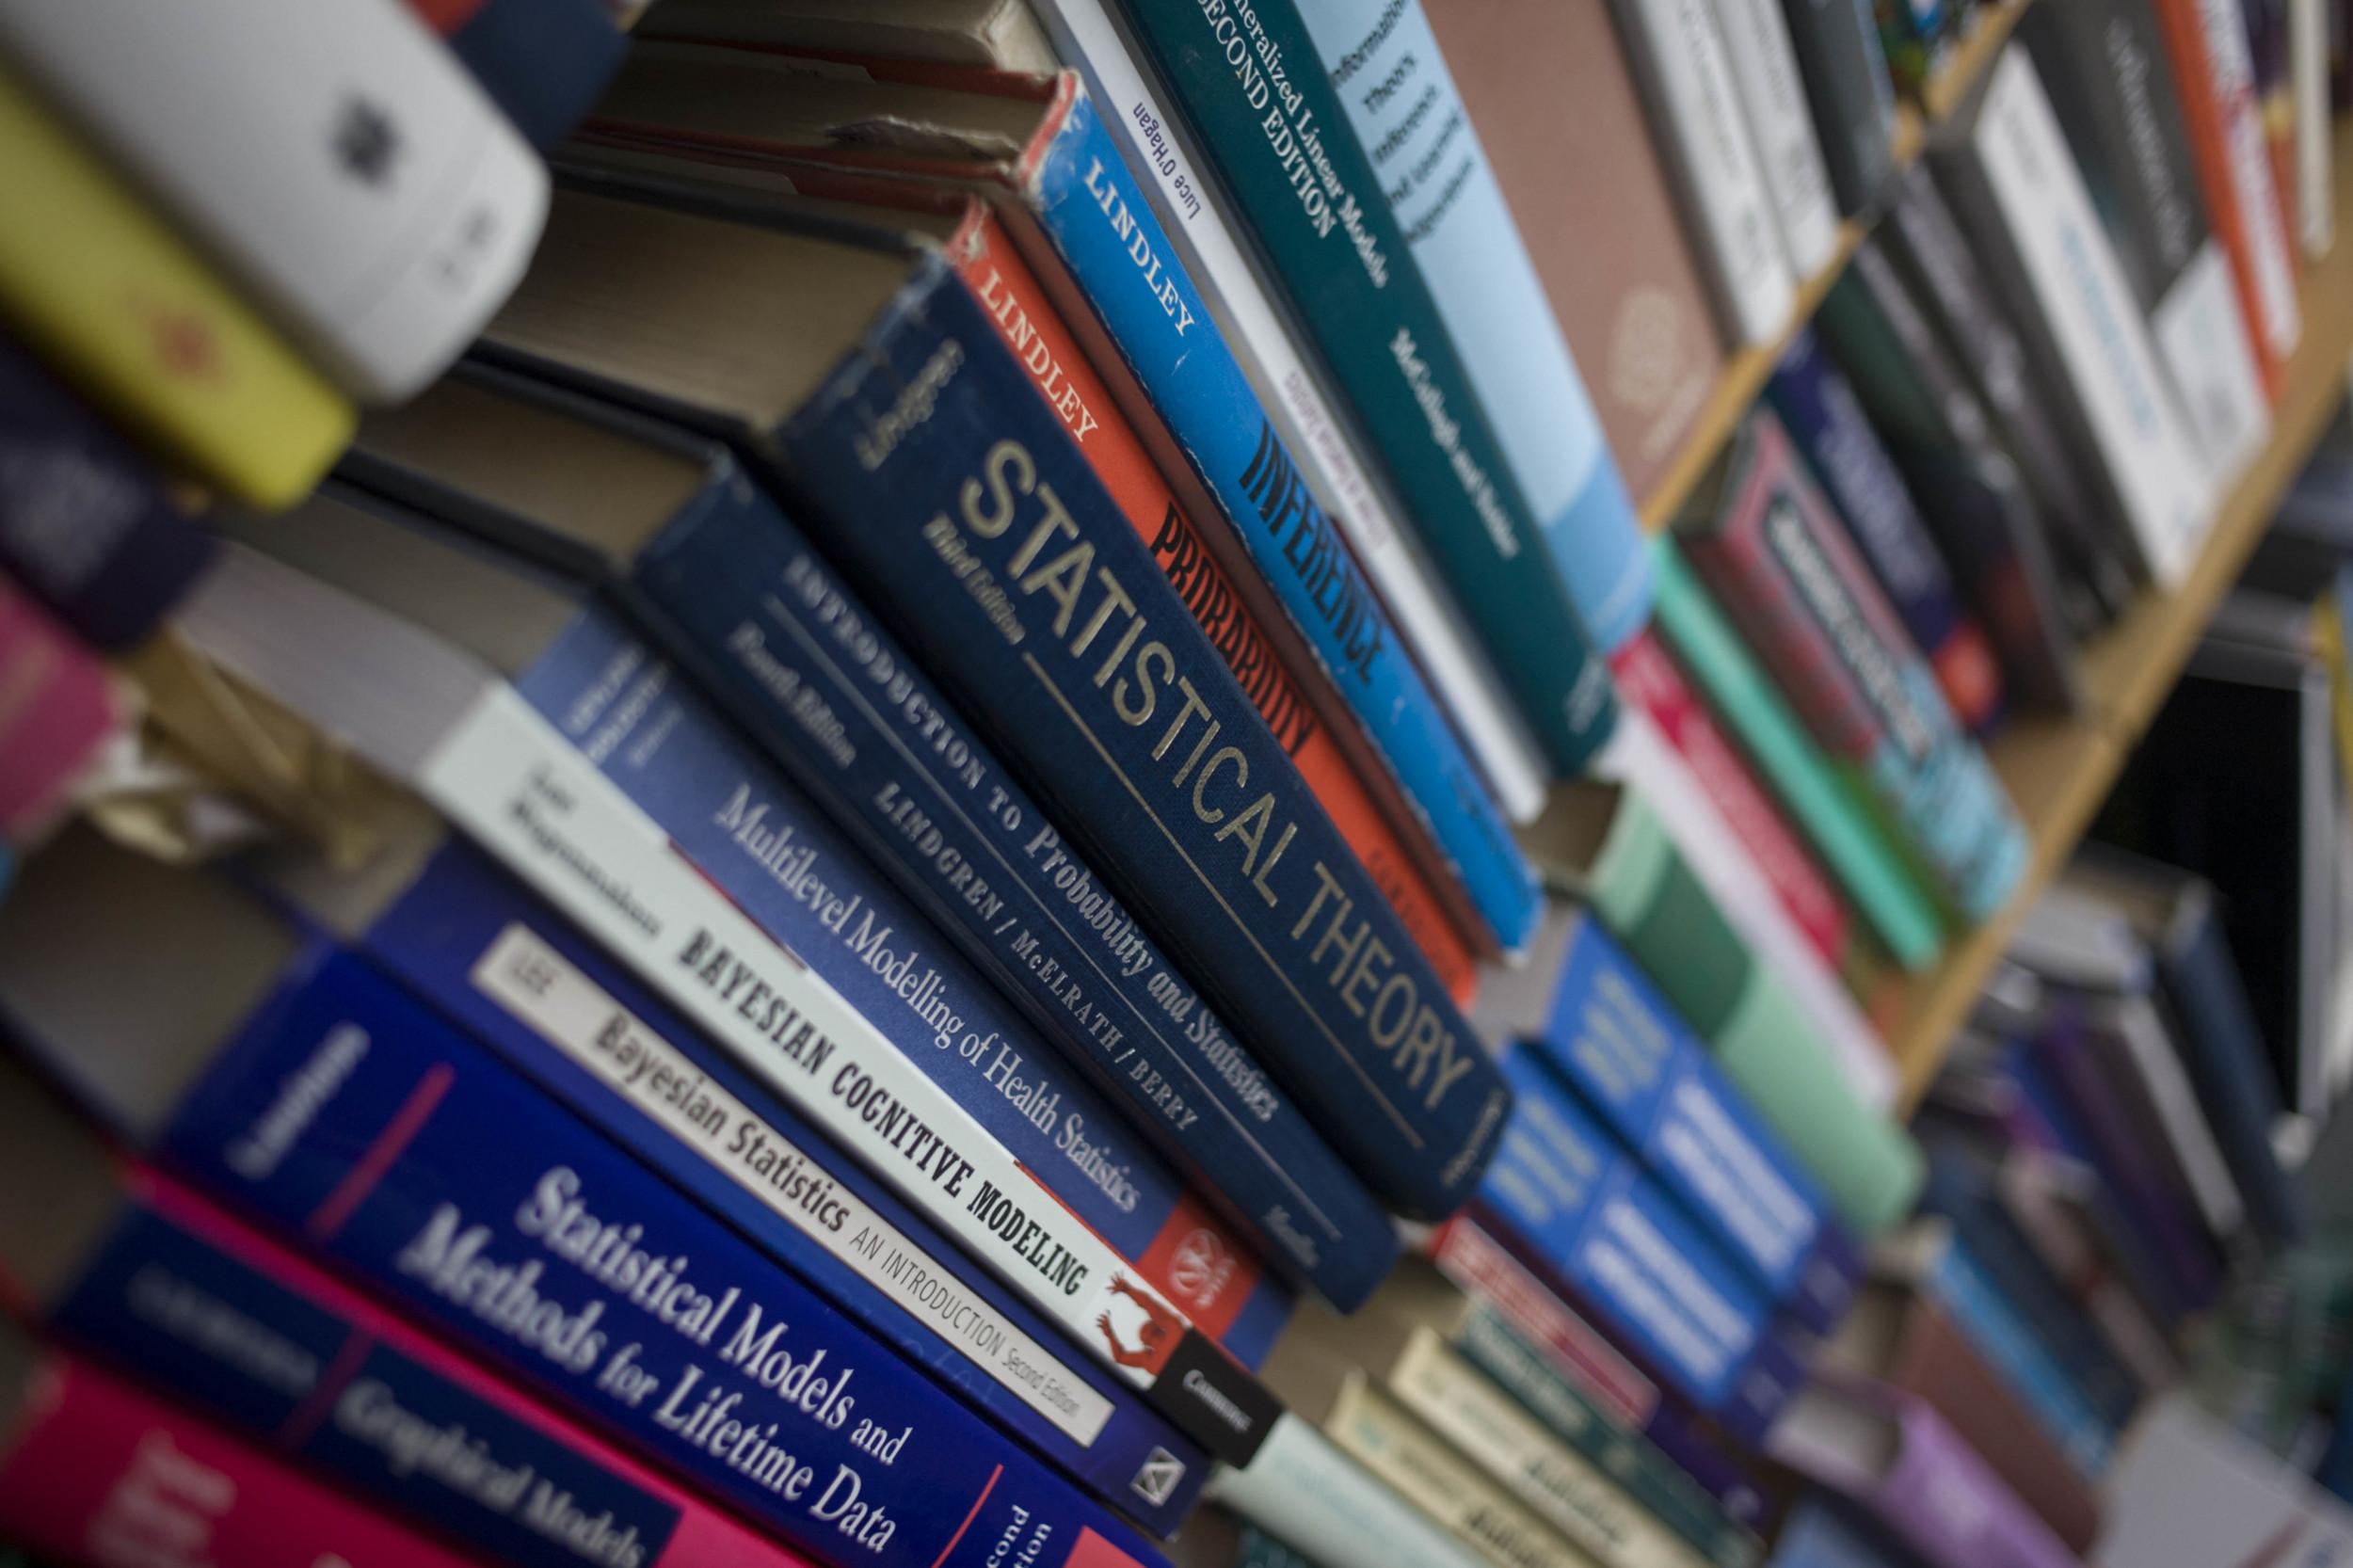 Biggest Textbook Publisher Pushing Students To Ebooks